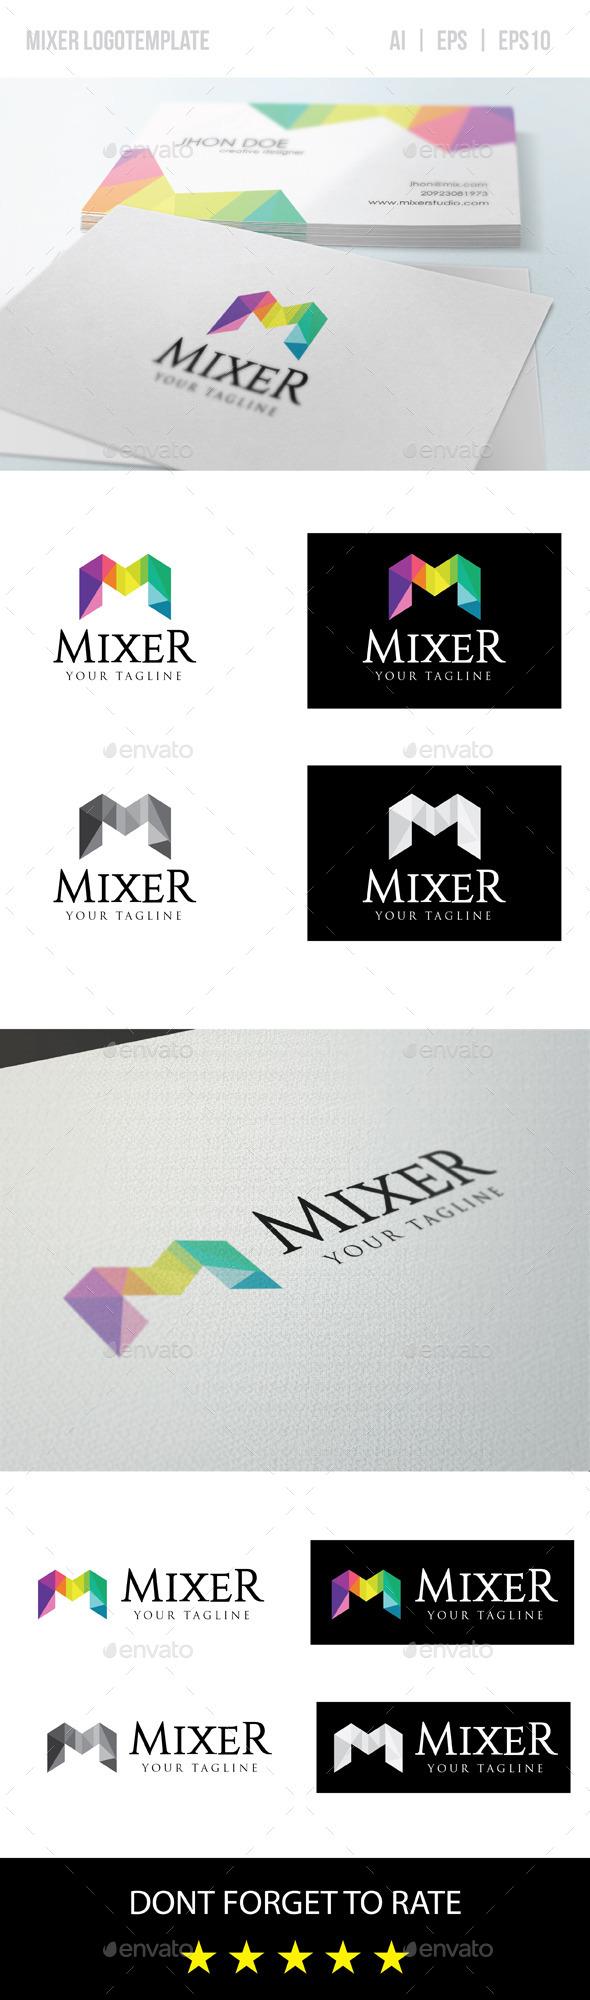 Mixer/Letter M Logo Template - Vector Abstract